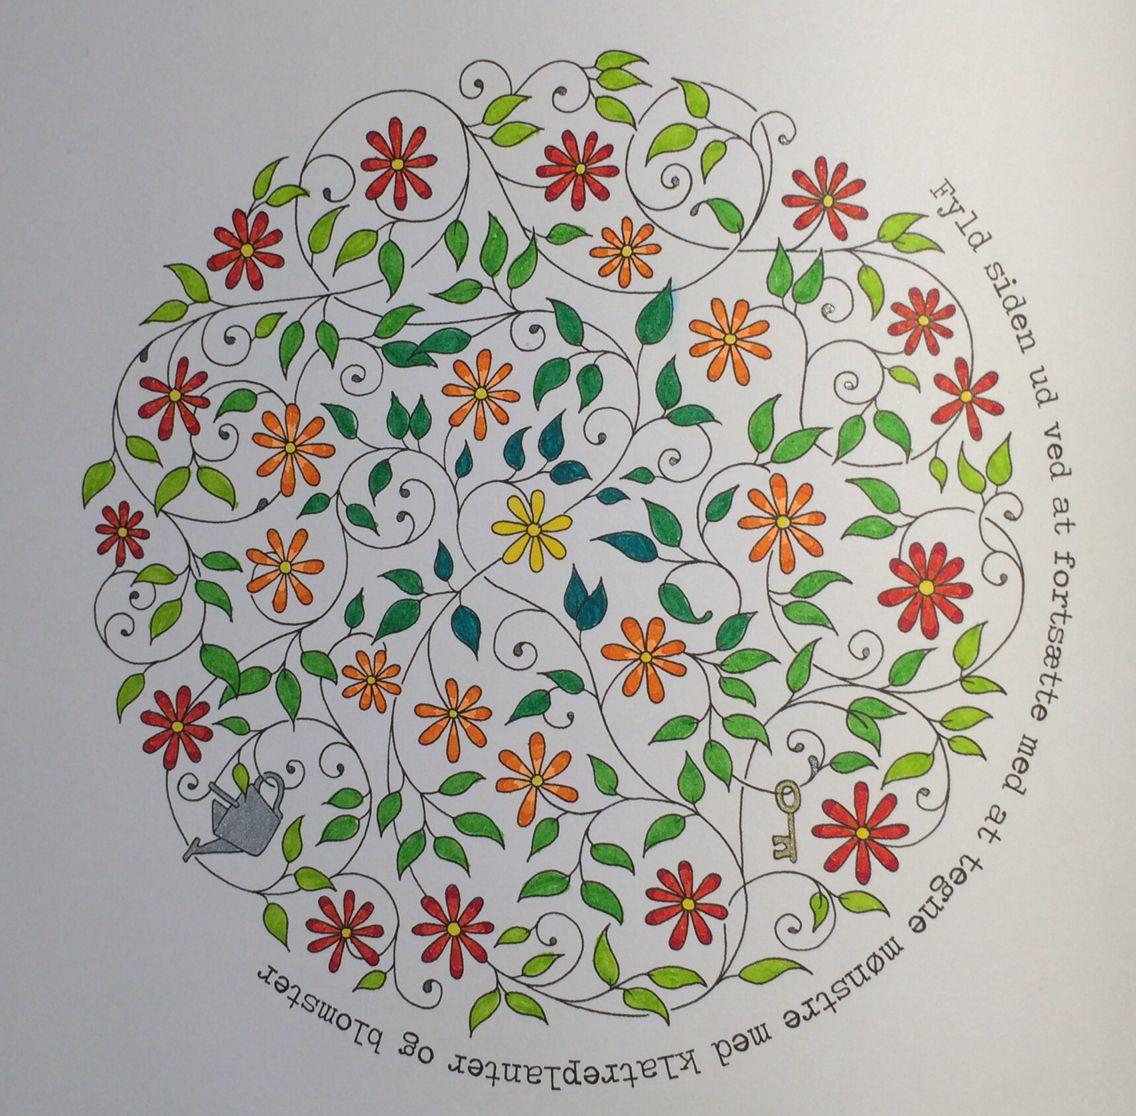 Flower Circle From Johanna Basfords Secret Garden Triplus FinelinerGel PensAdult ColoringColoring BooksCircles